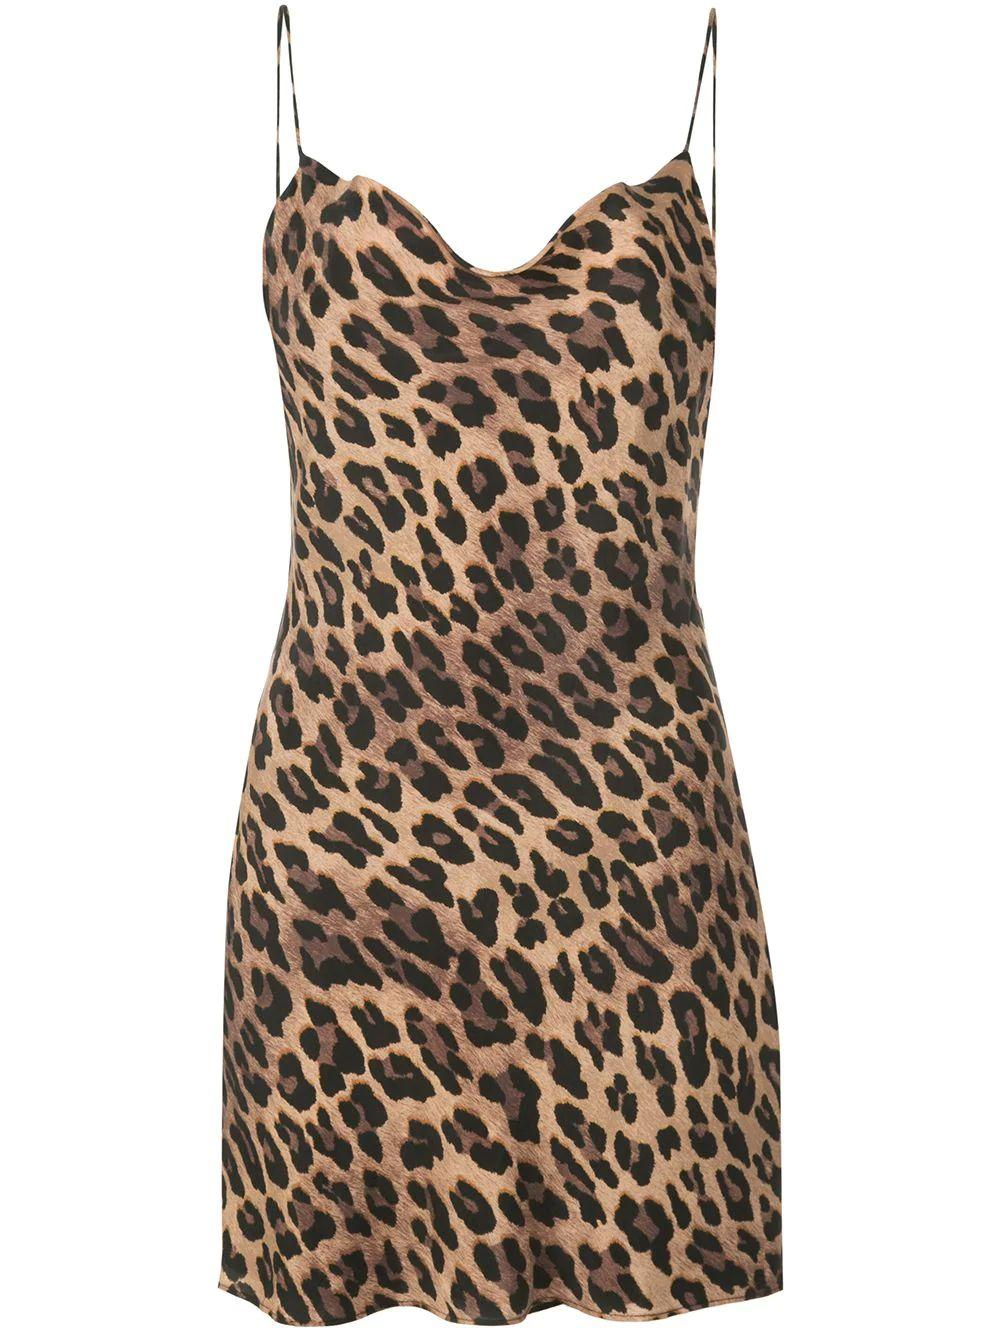 Harmony Drapey Slip Dress